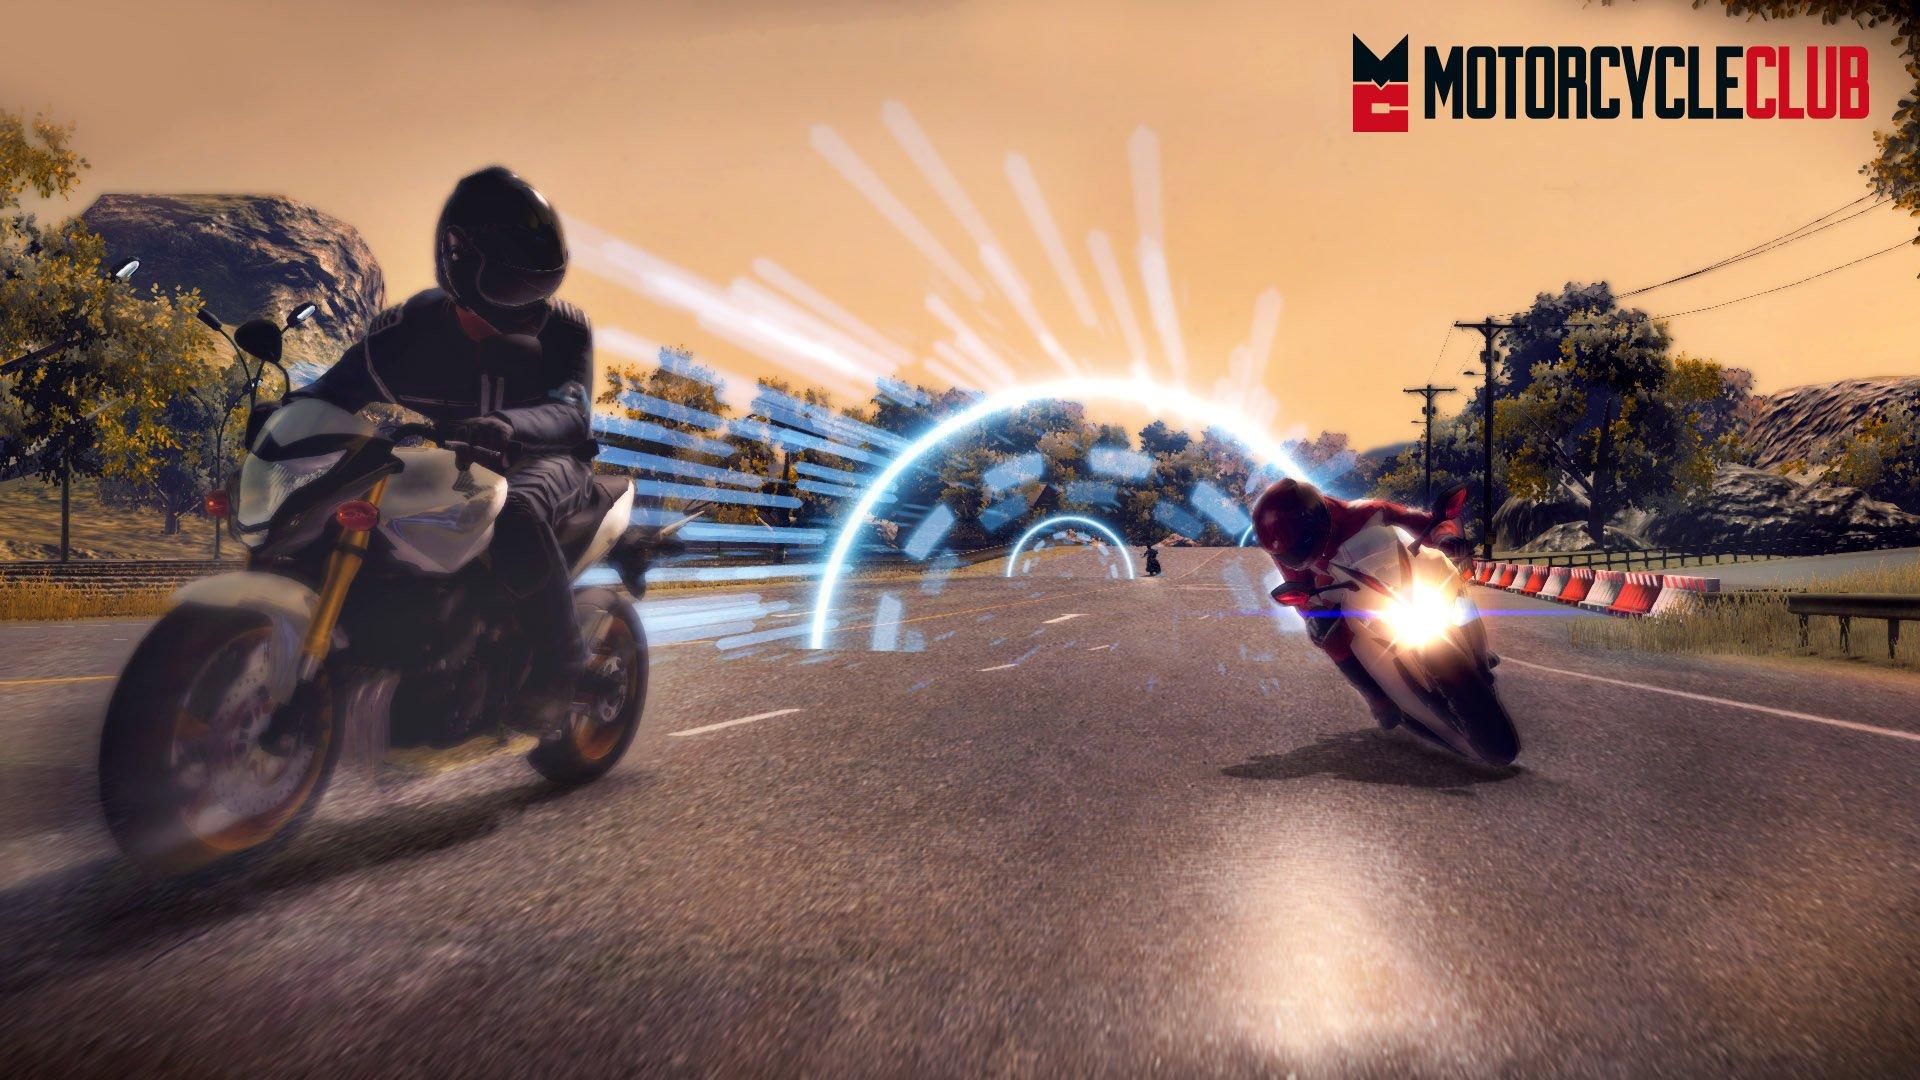 Motorcycle Club 1